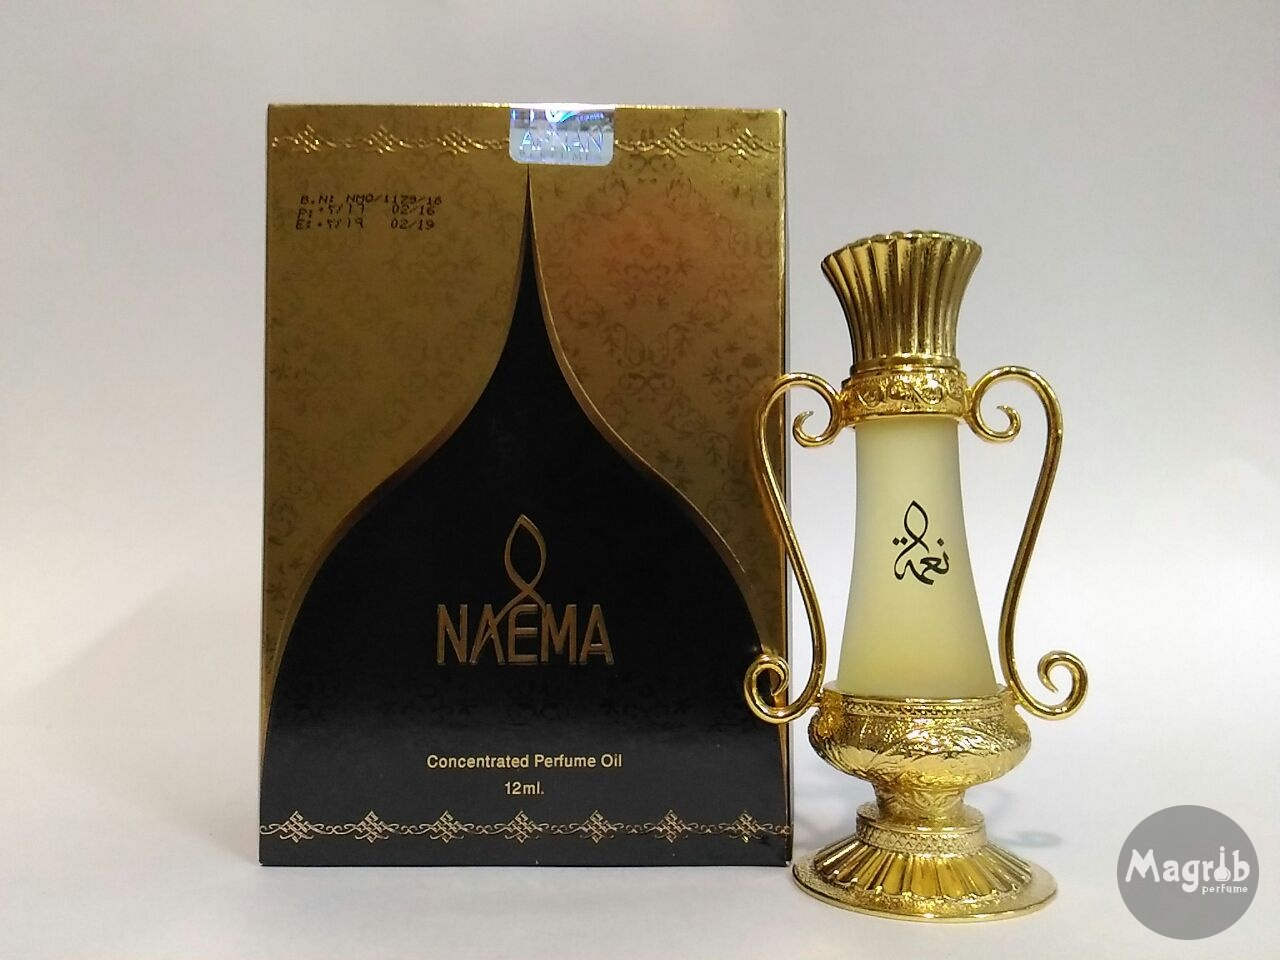 Afnan Naema 12ml - унисекс, масляные духи